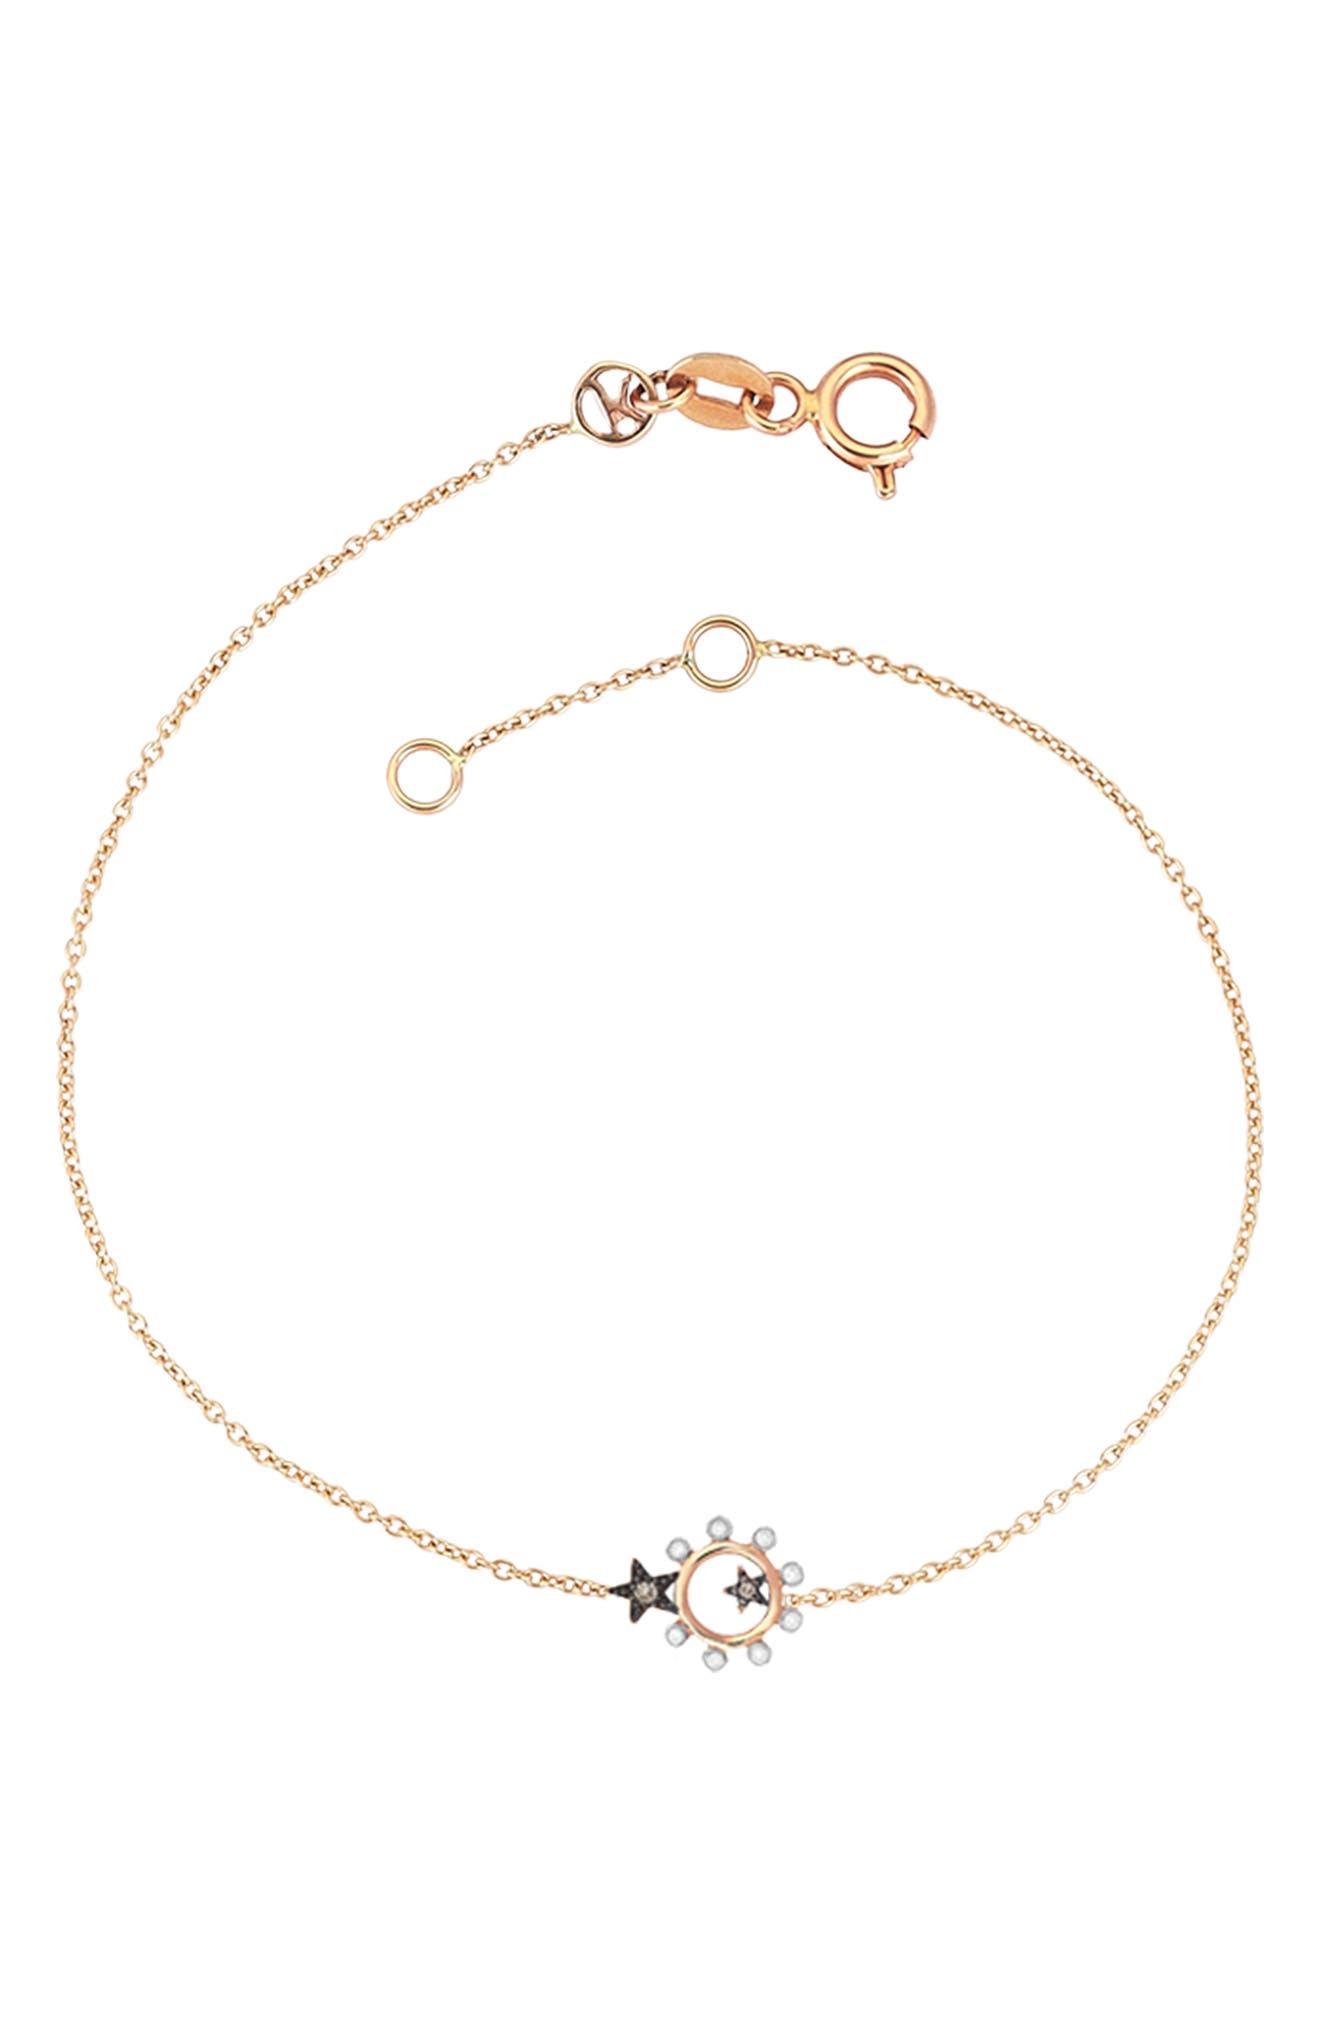 KISMET BY MILKA, Eclectic Star Bracelet, Main thumbnail 1, color, ROSE GOLD